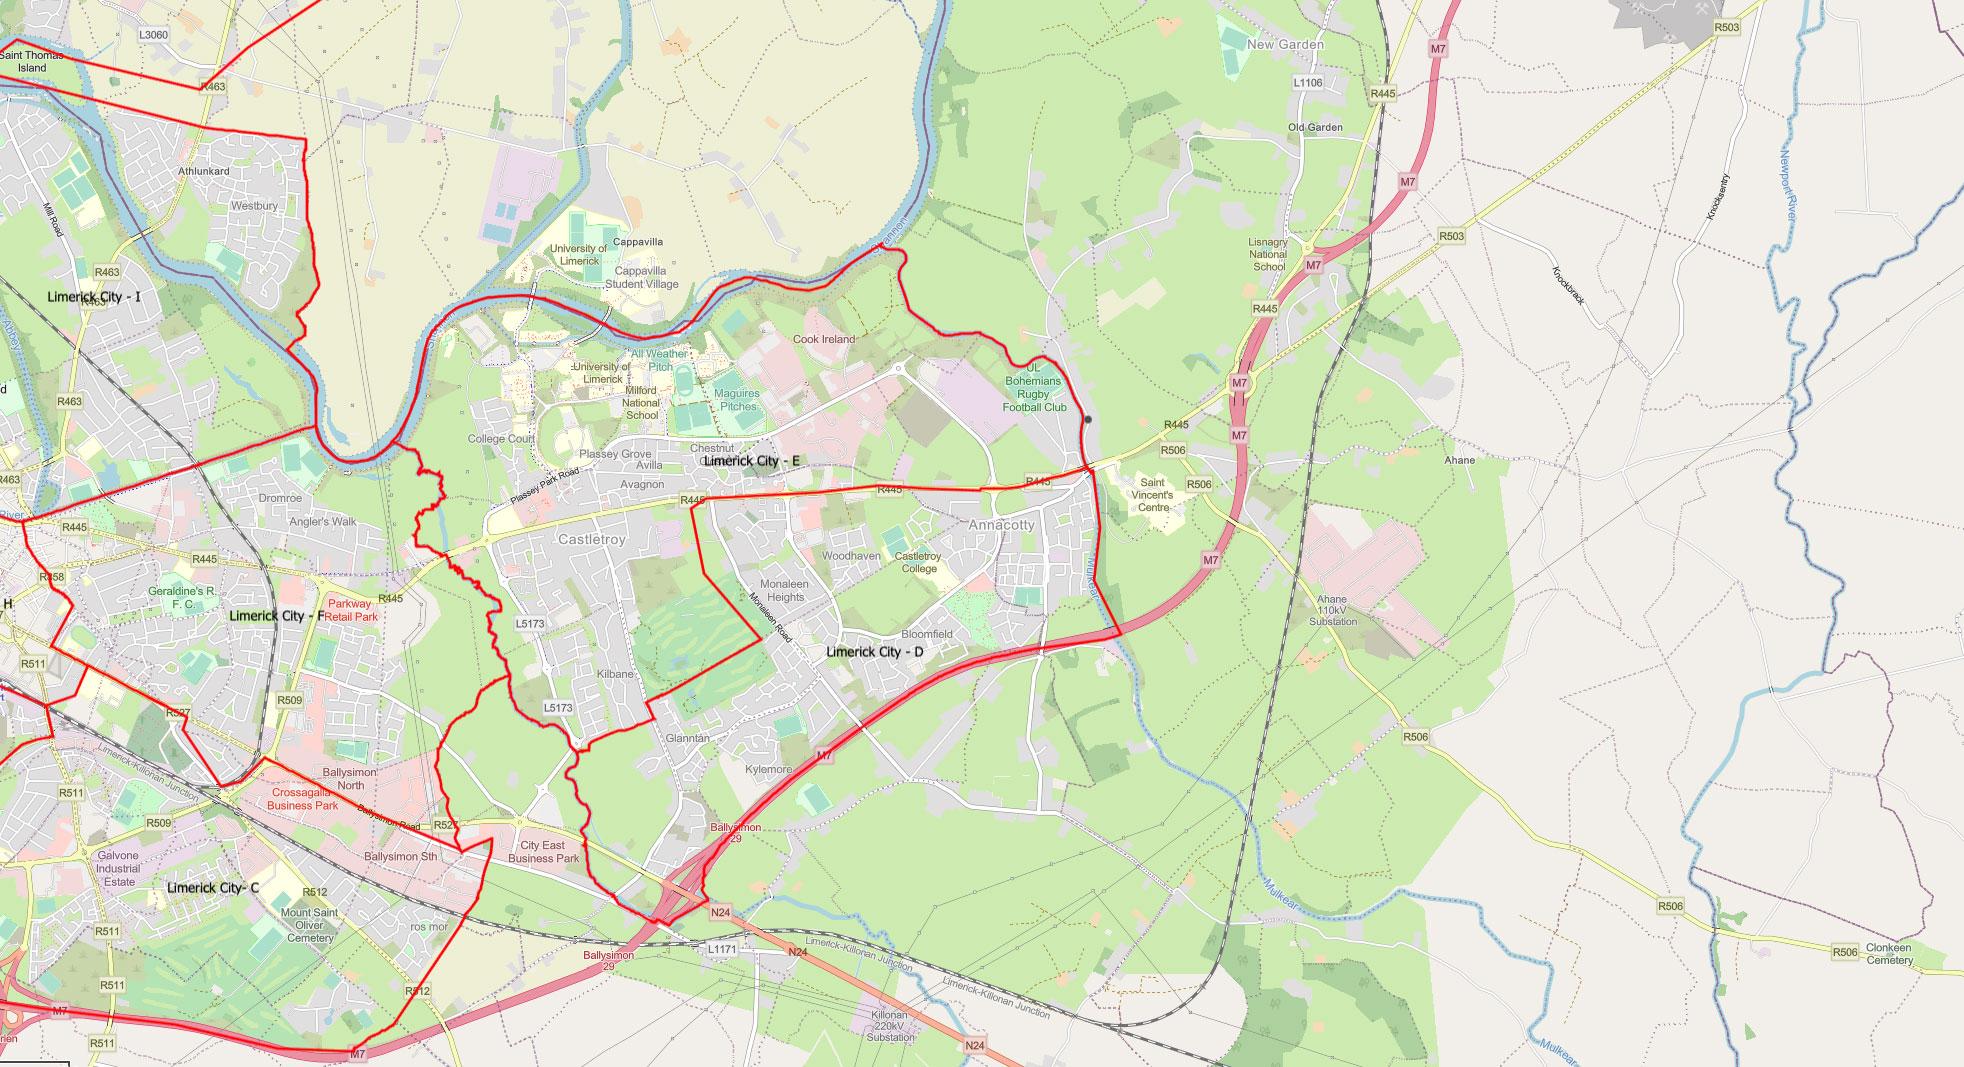 solar-panels-annacotty-limerick-ireland-map-img